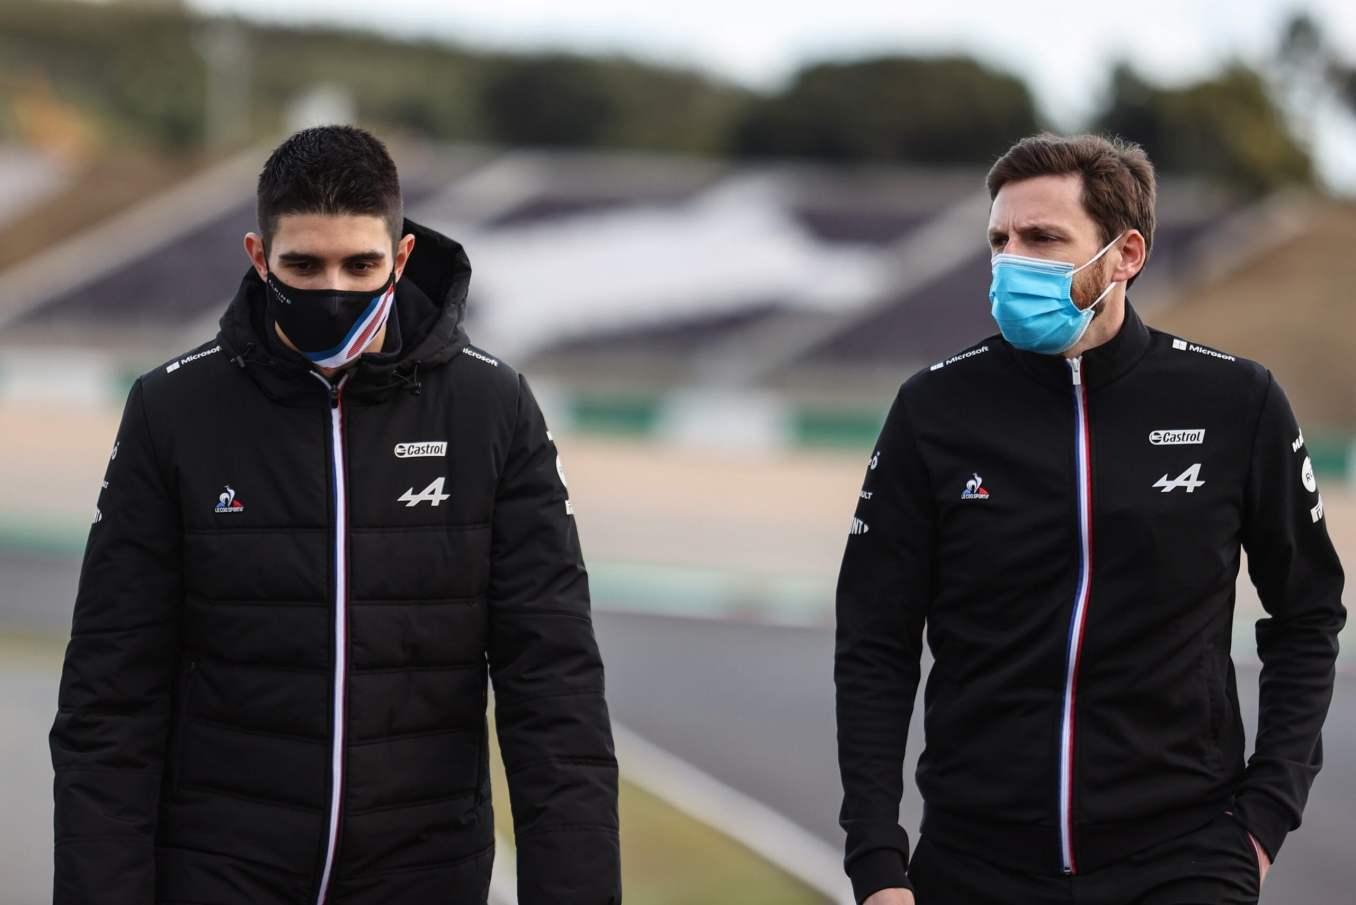 Alpine F1 Team alonso ocon Grand Prix Heineken du Portugal Formule 1 202114 scaled   Alpine F1 Team : Grand Prix Heineken du Portugal de Formule 1 2021